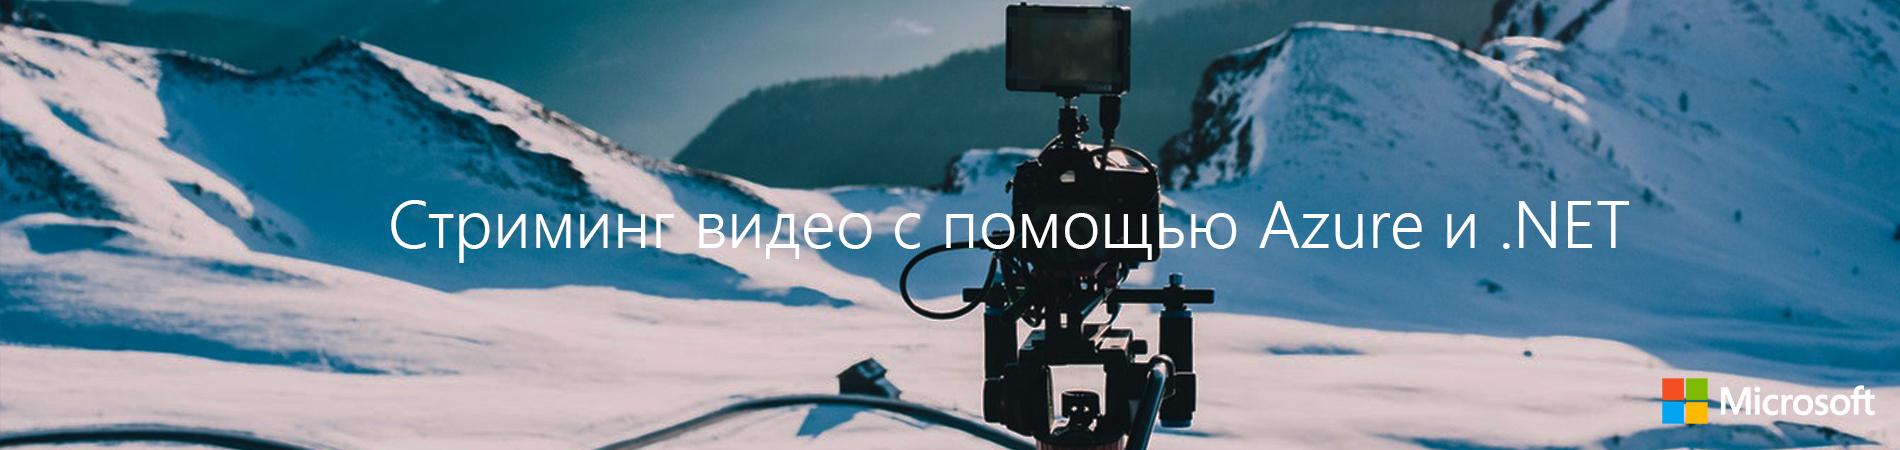 Стриминг видео с помощью Azure и .NET